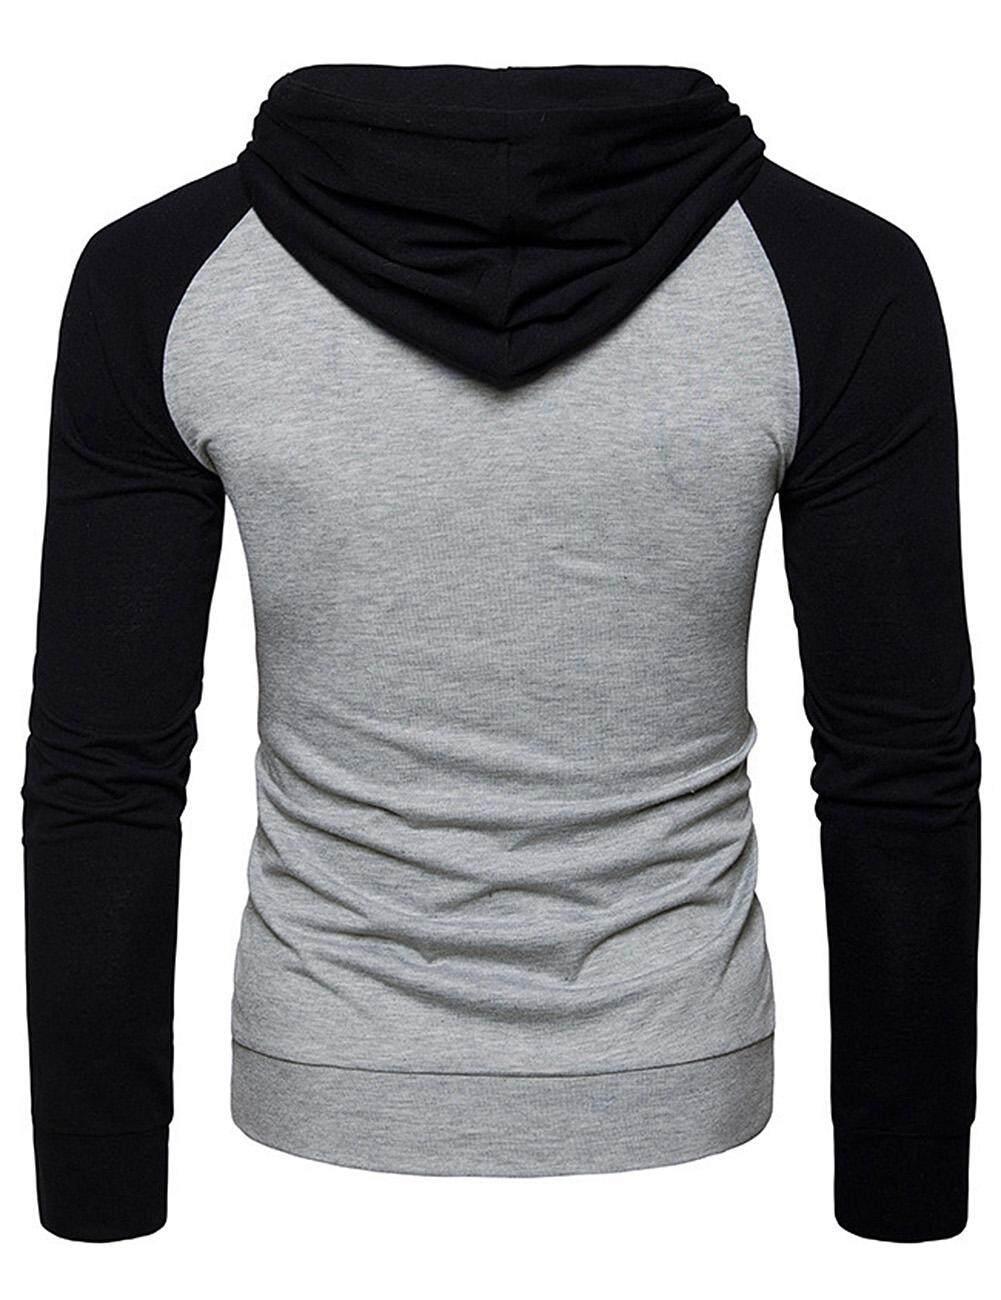 LB Men Crewneck Sweatshirt Casual Stitching Hoodies Long Sleeve Slim Pullover - 3